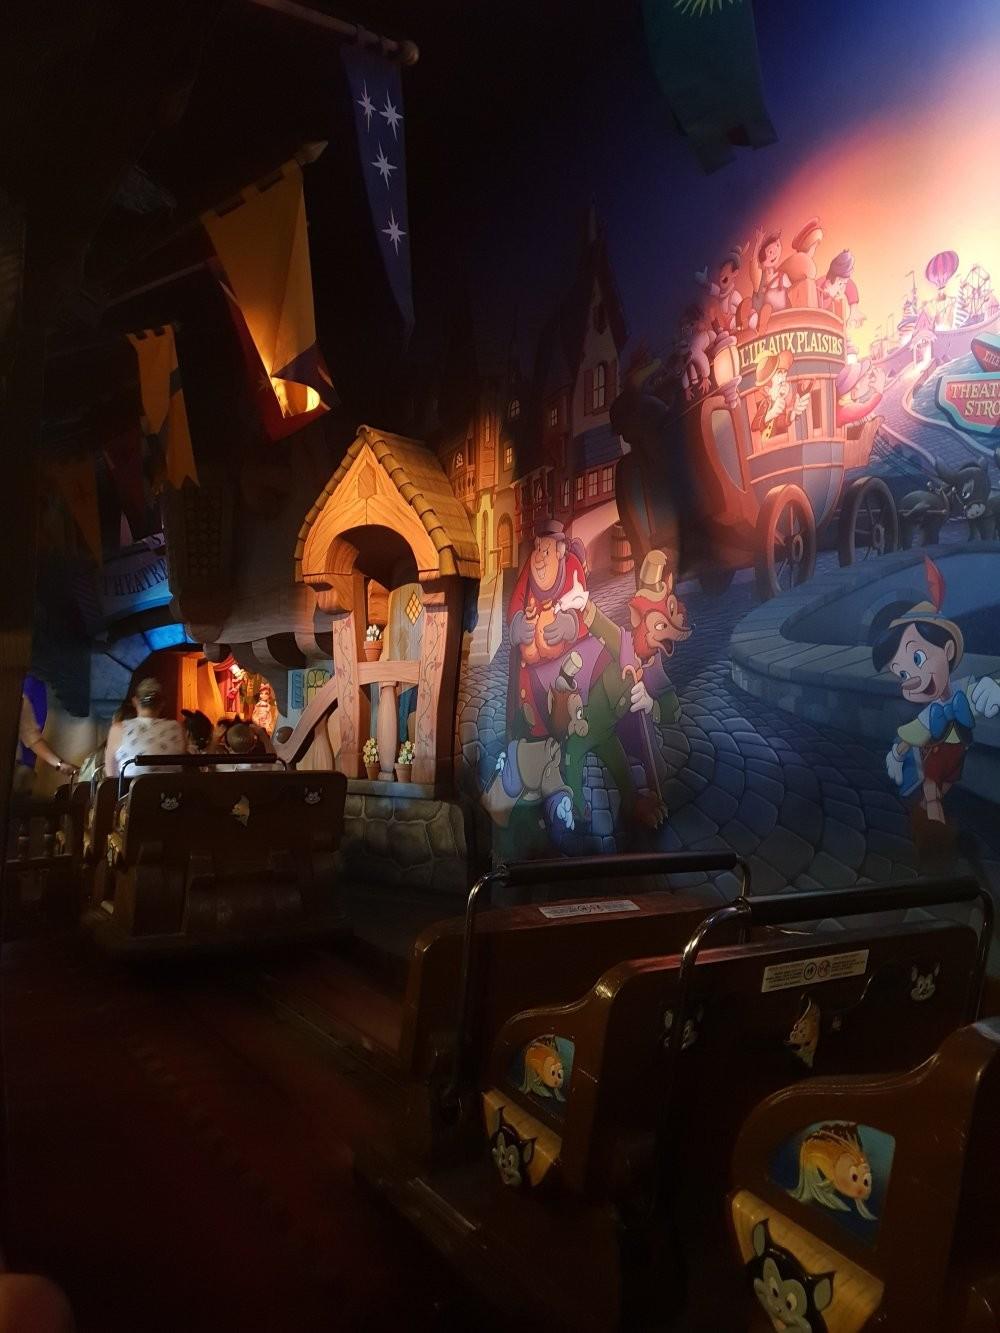 Childhood dream: Disneyland Paris and Val d'Europe